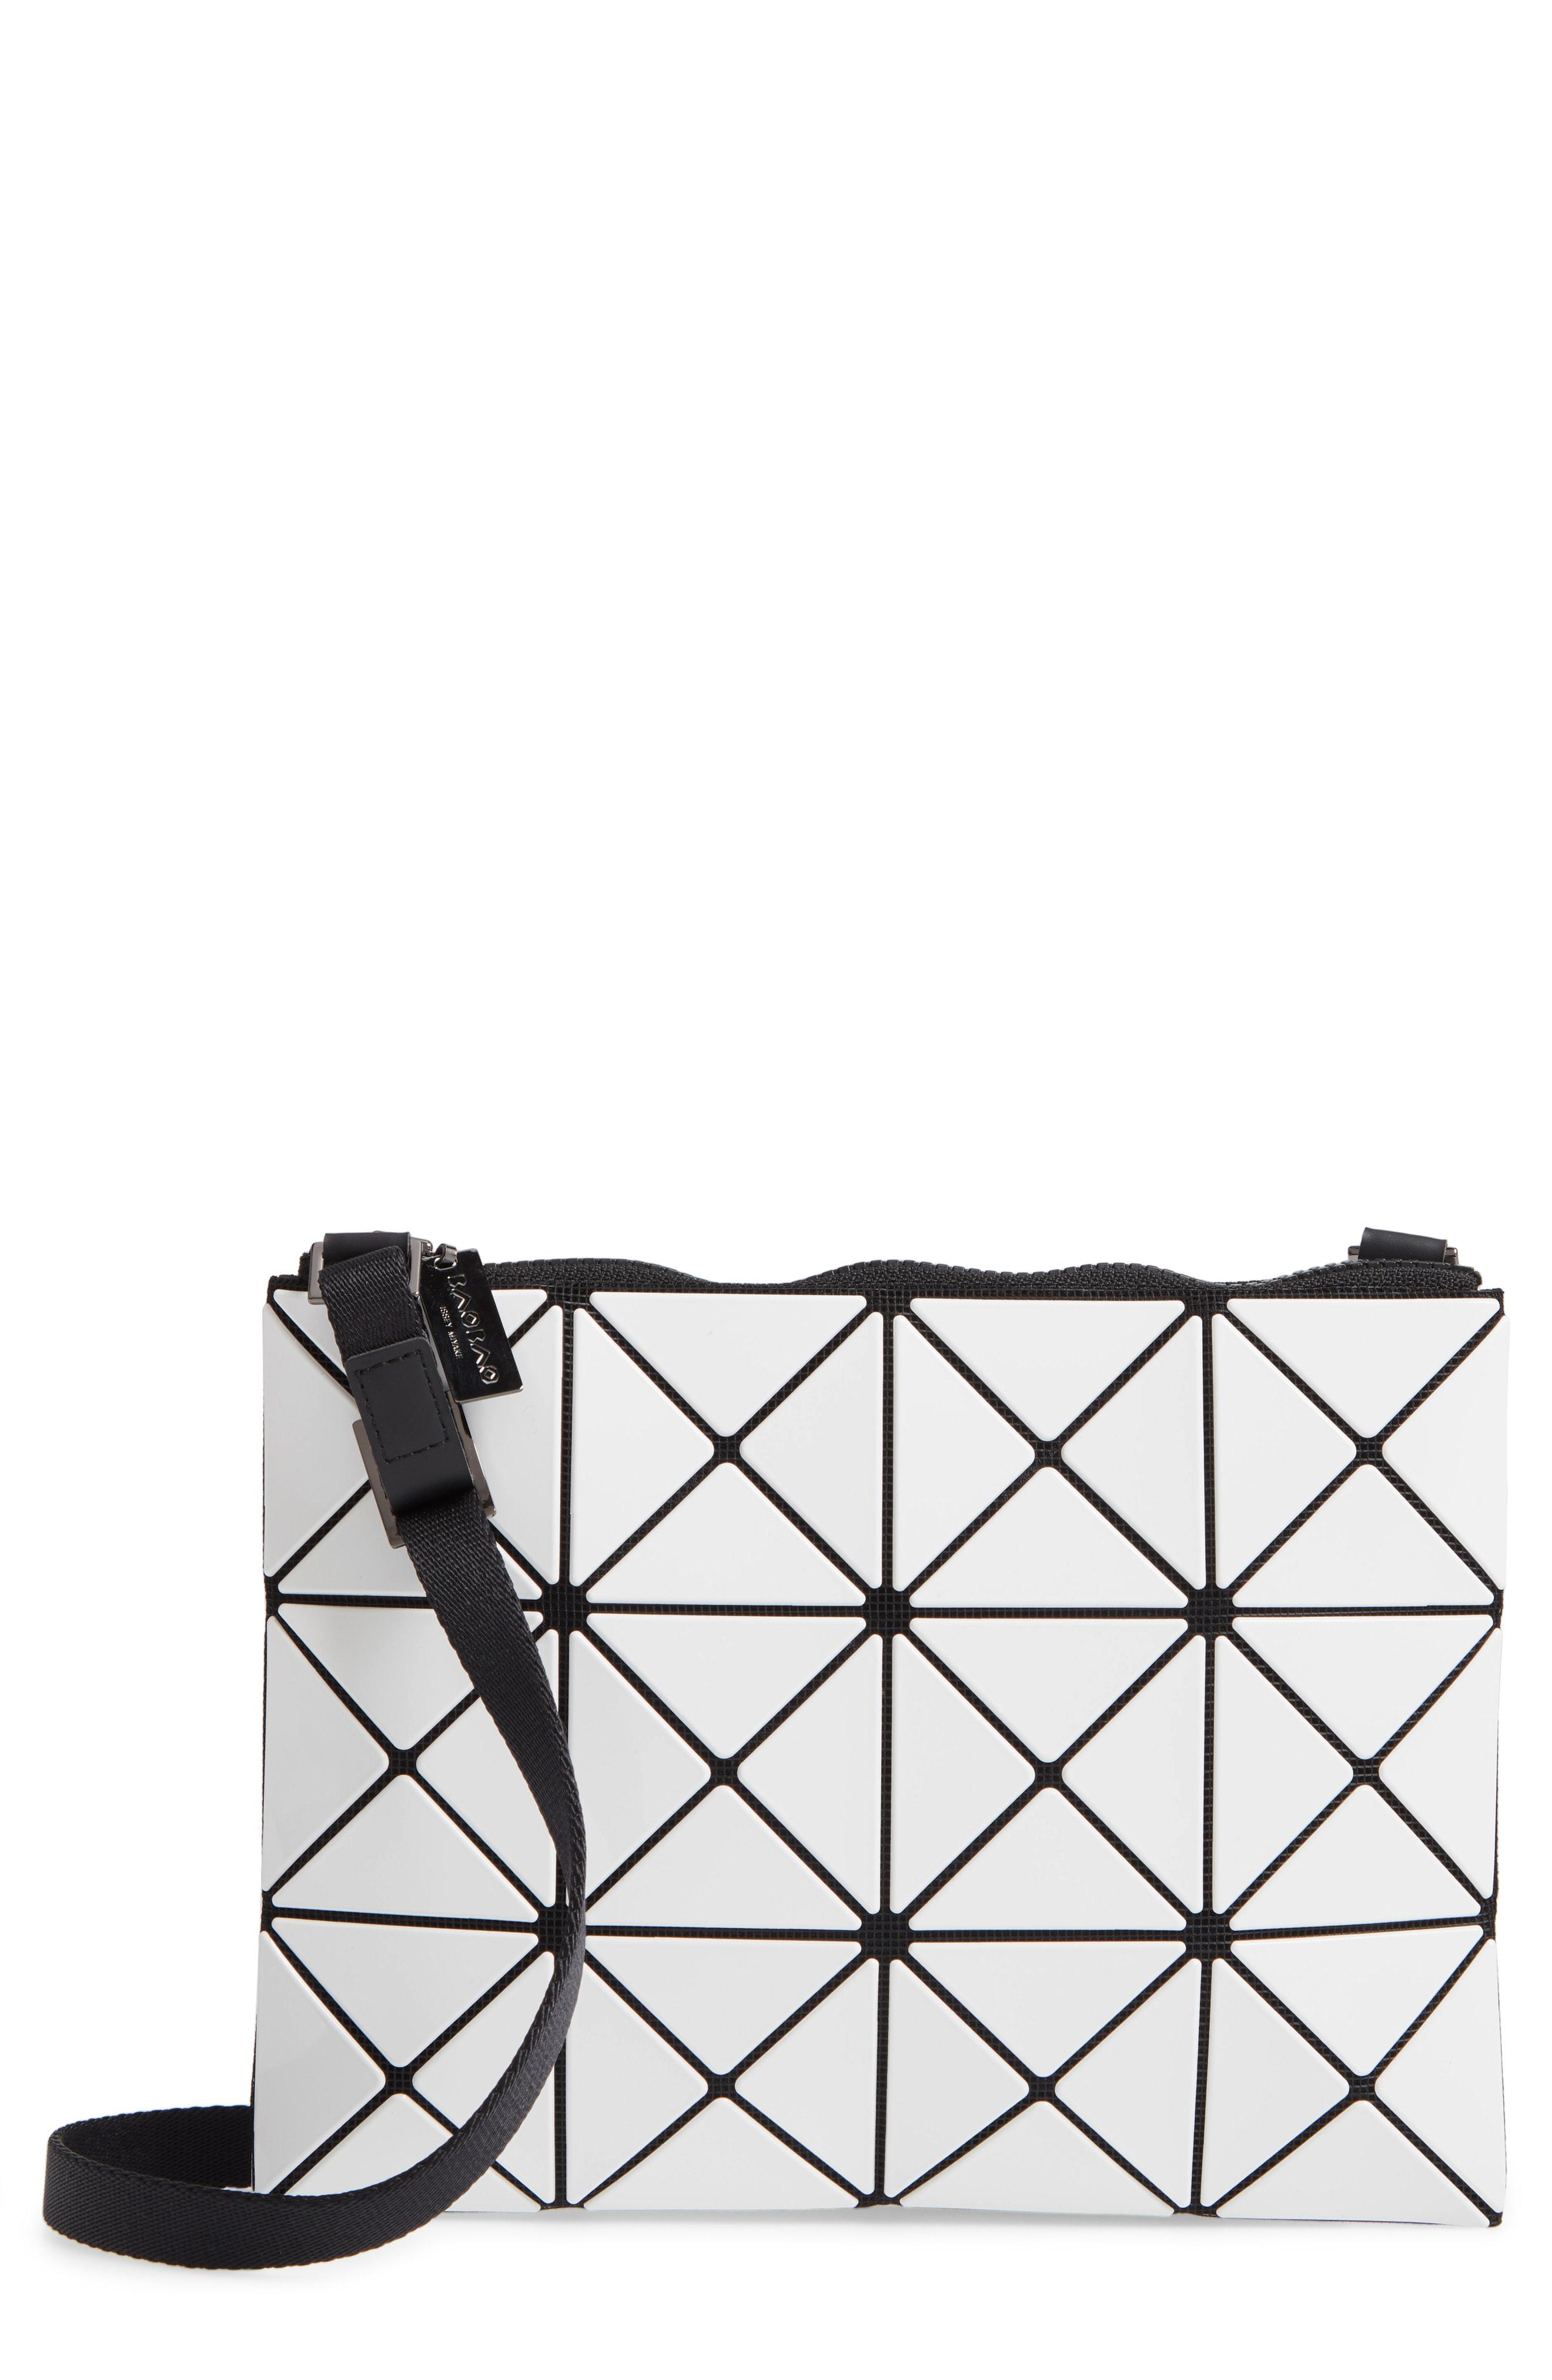 baa3275de1 Bao Bao Issey Miyake Small Lucent Crossbody Bag - White